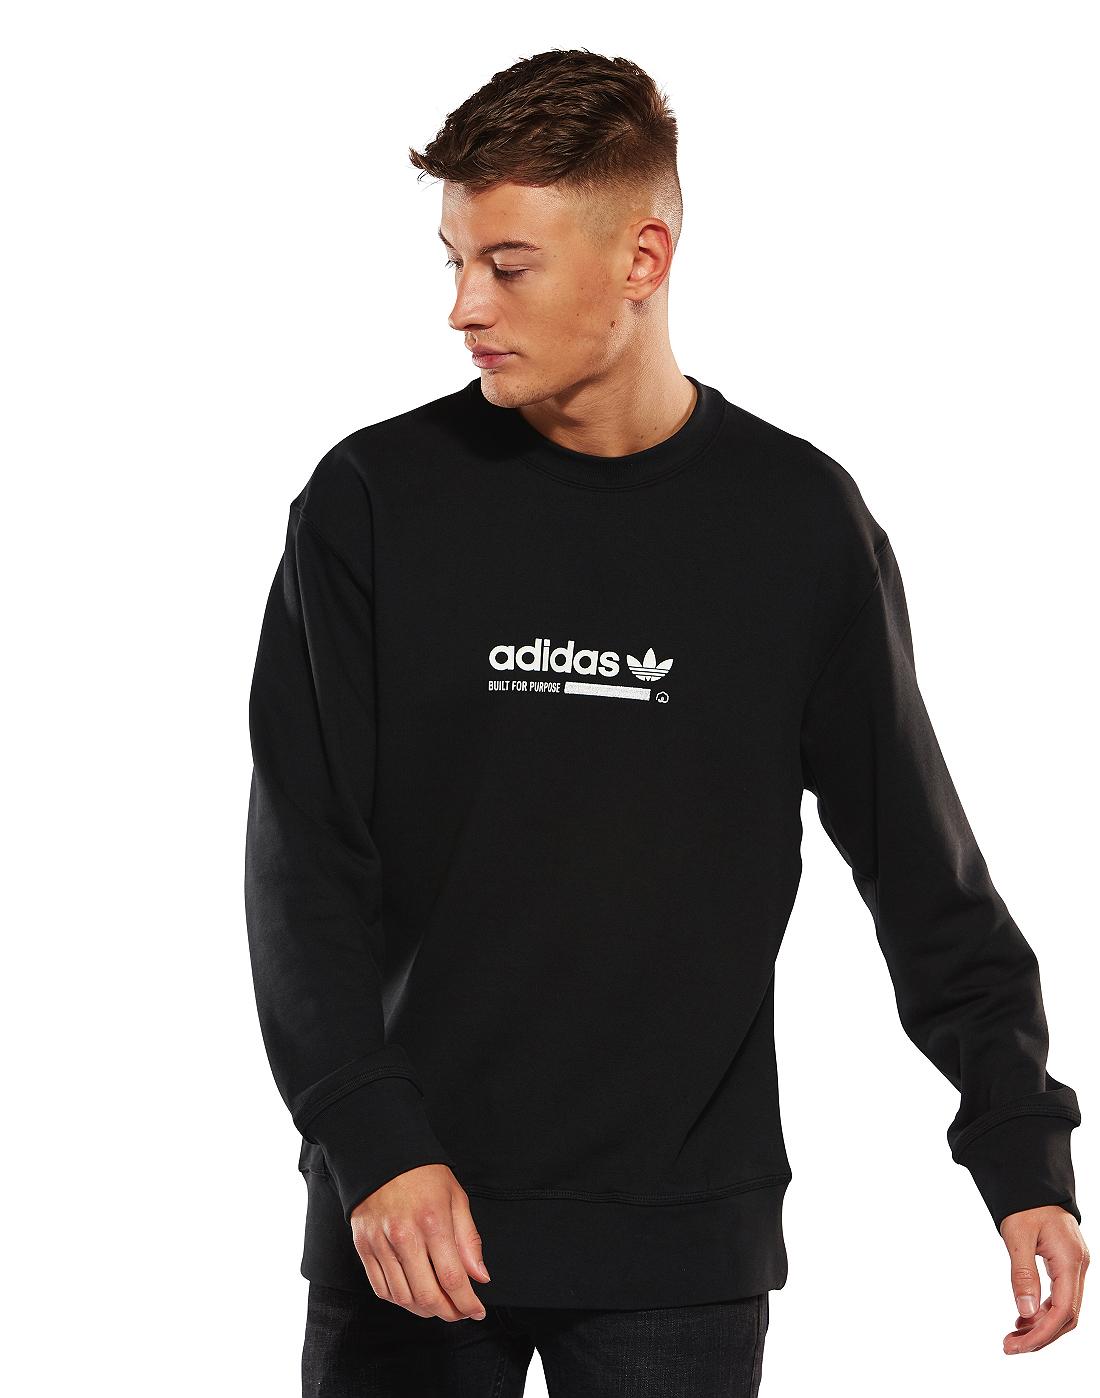 23fc8edb Men's adidas Originals Black Kaval Crew Top | Life Style Sports